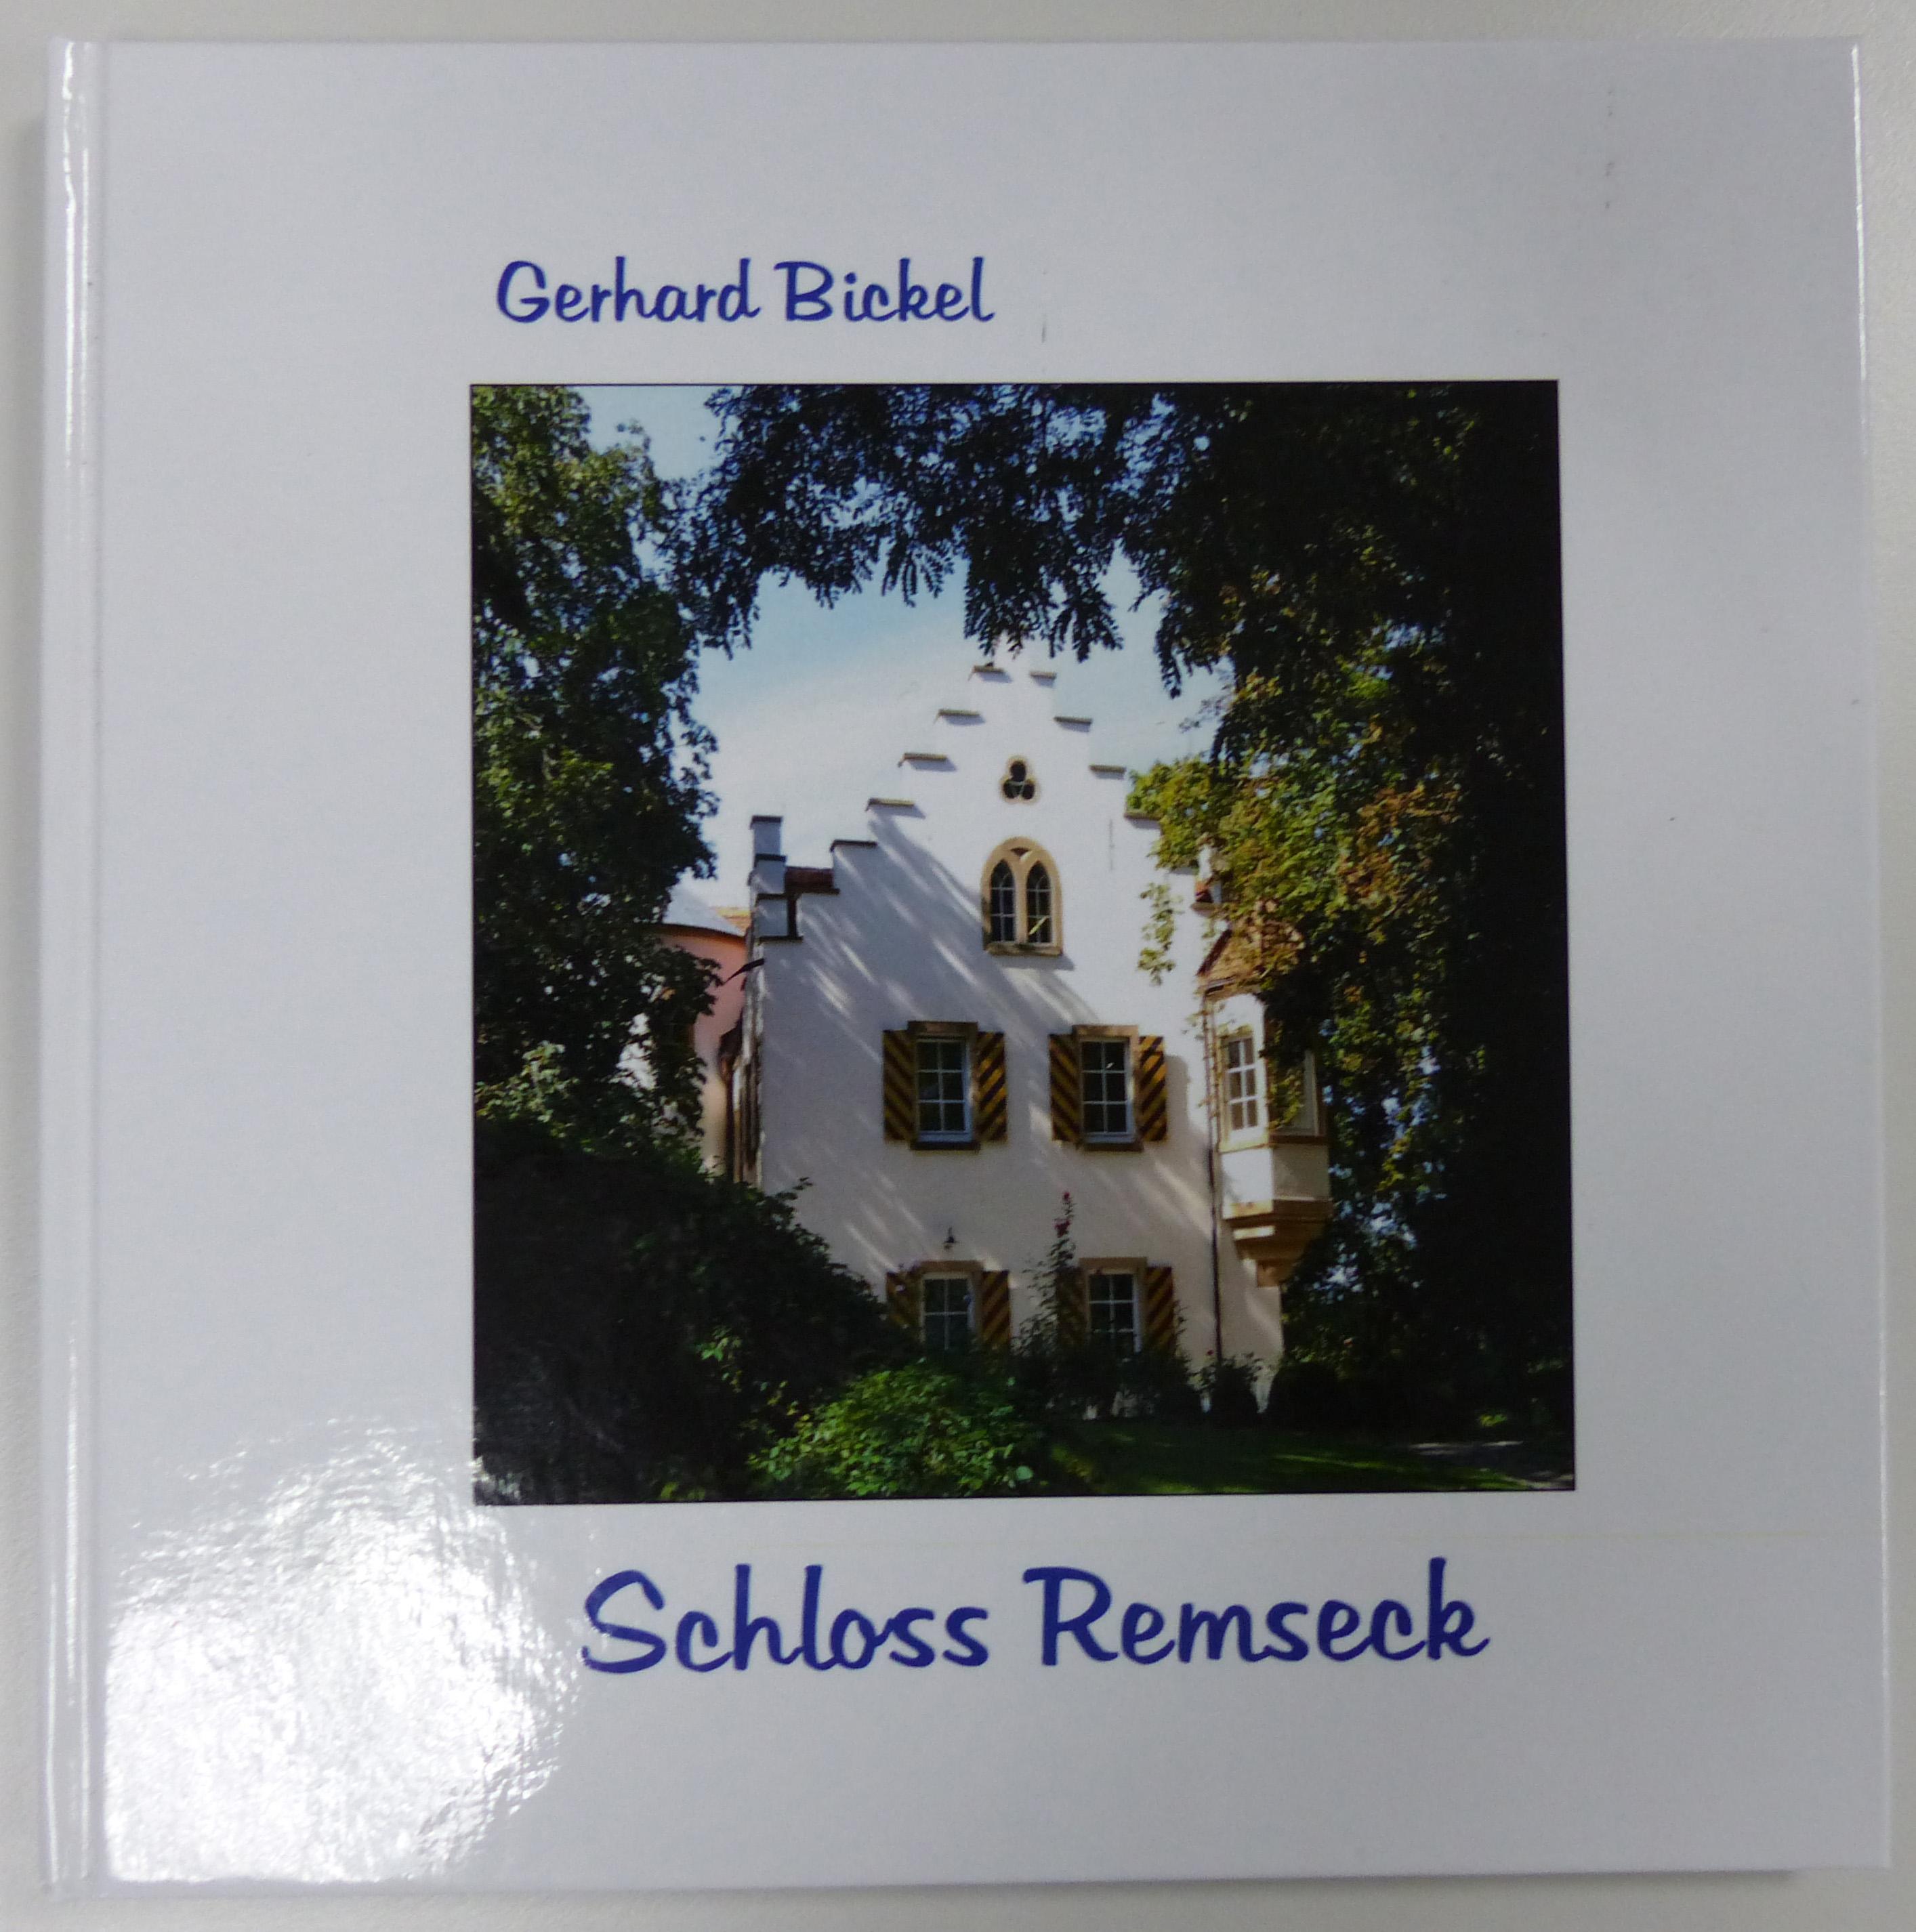 Gerhard Bickel: Schloss Remseck